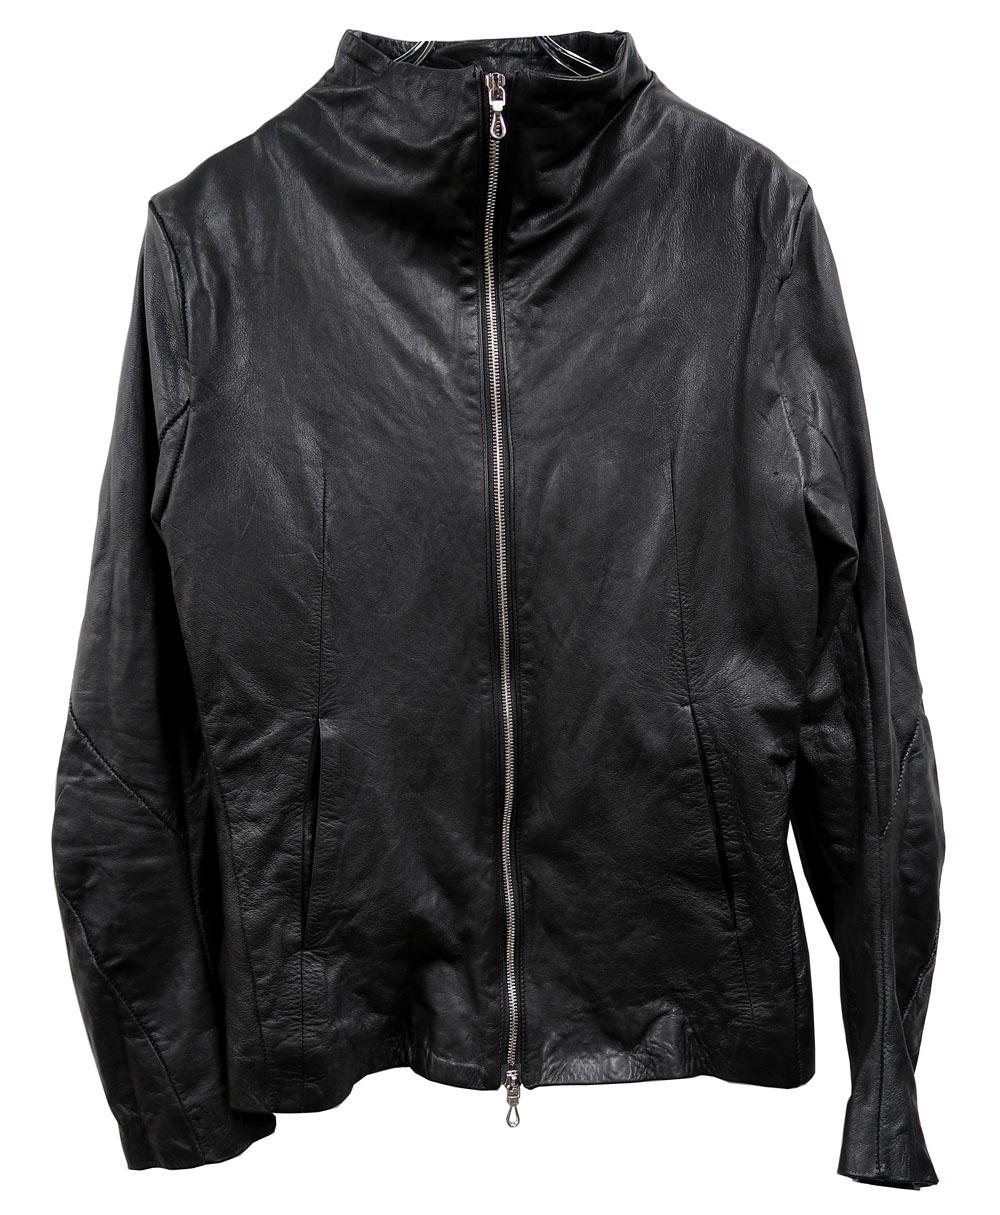 Goat Leather Blouson *2色